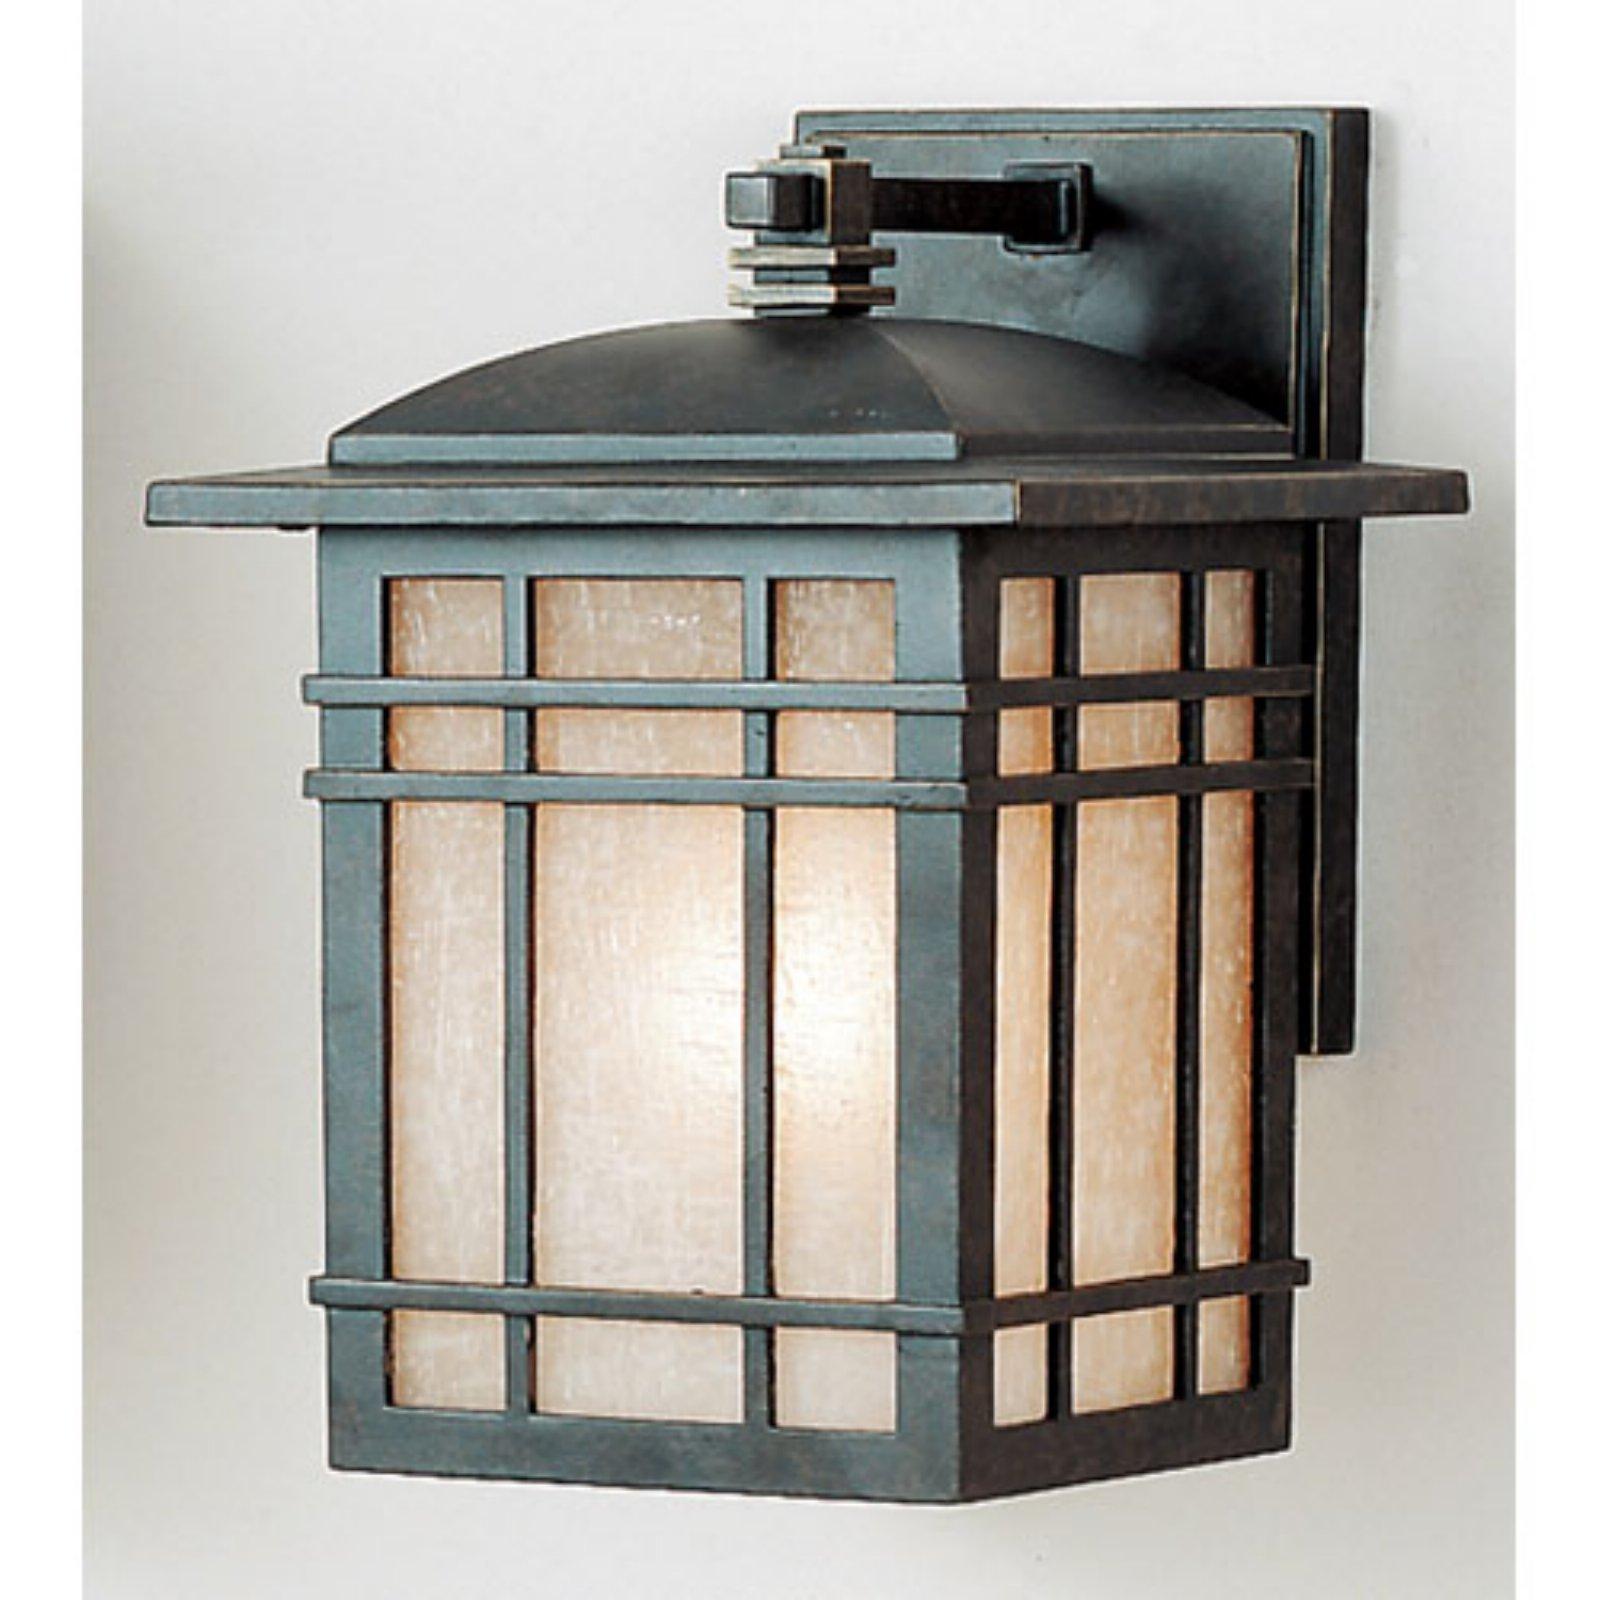 Quoizel Hillcrest HC8407IB Outdoor Wall Lantern